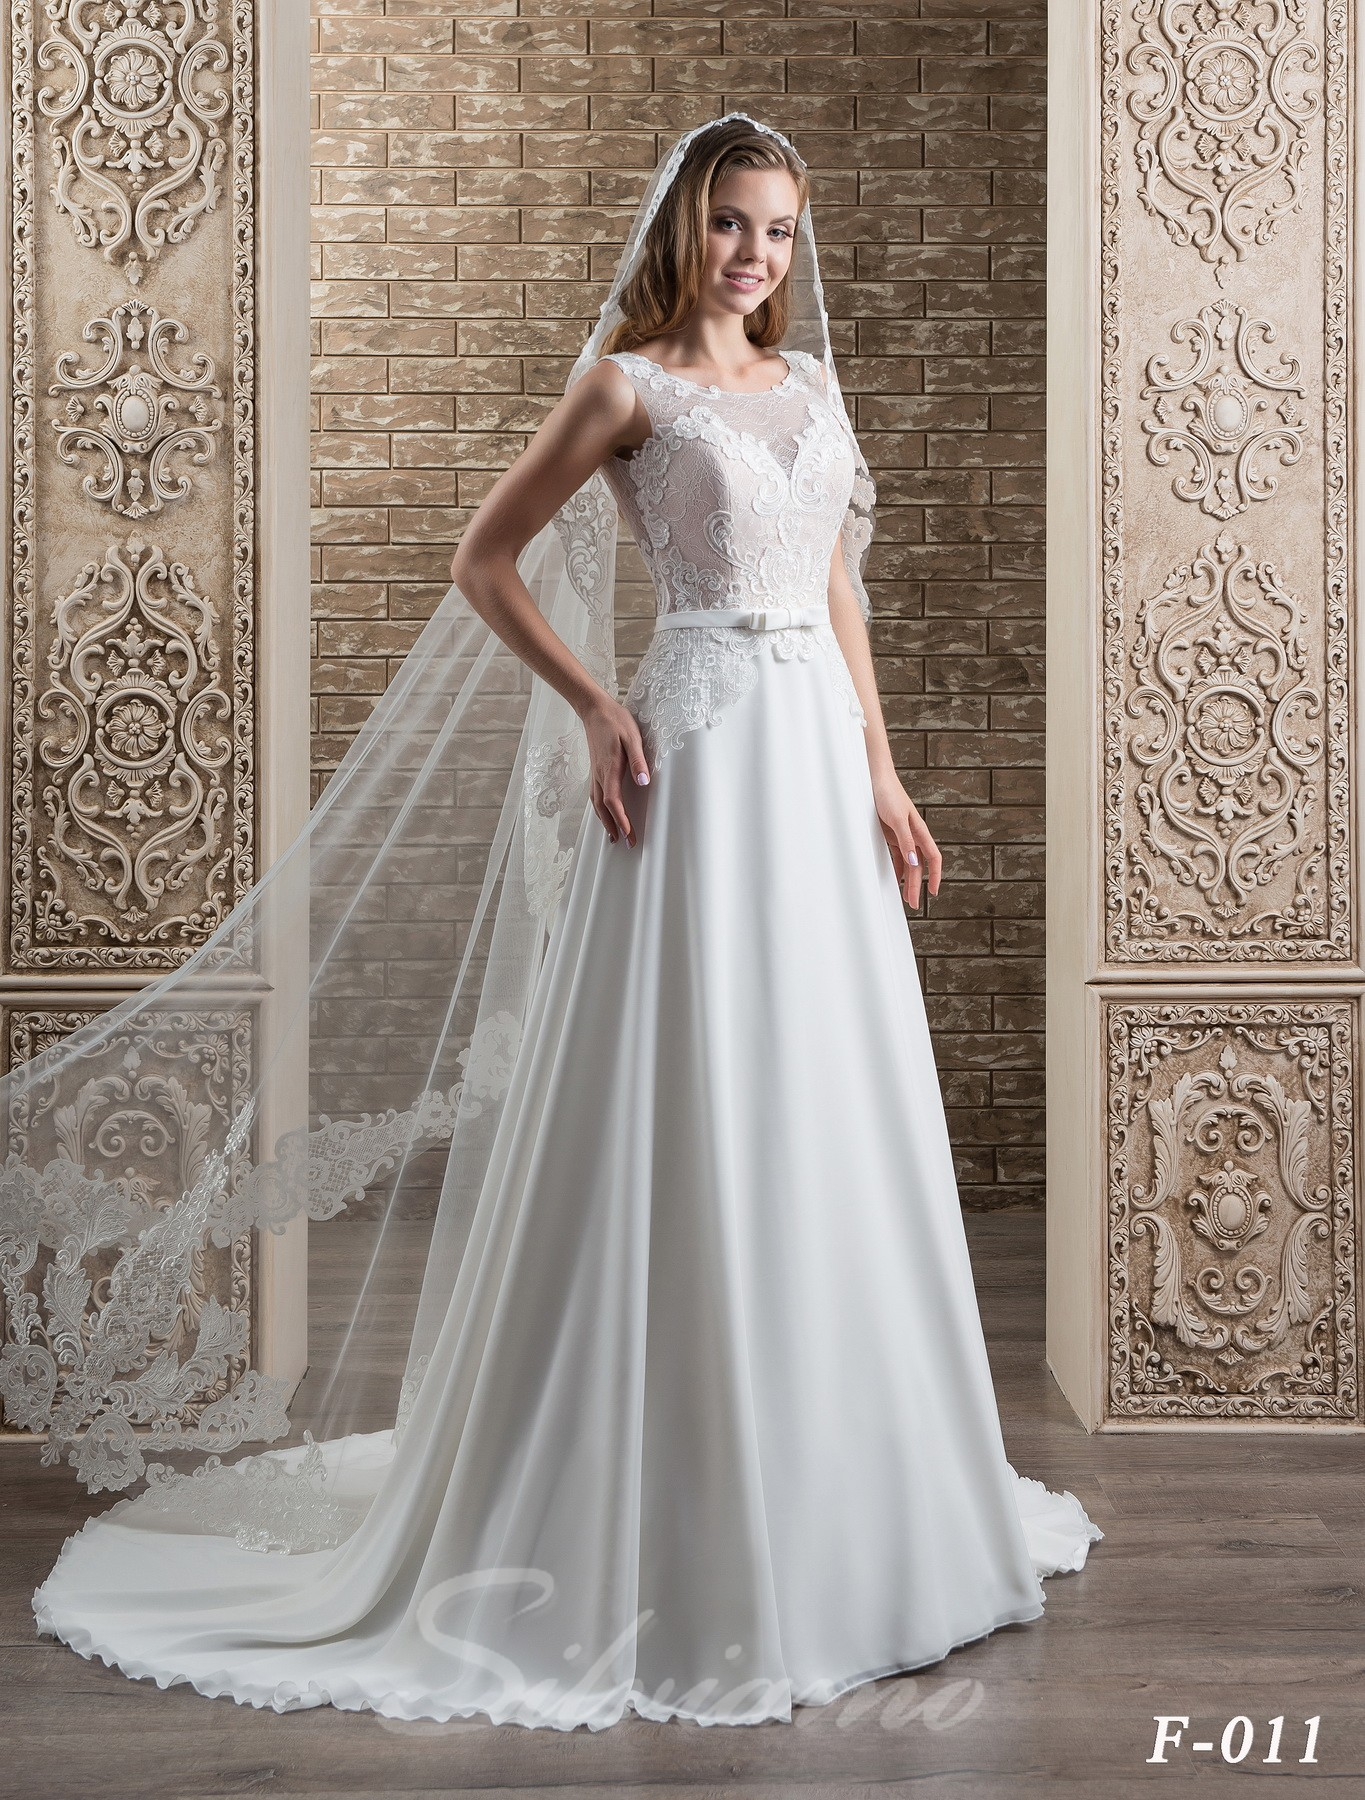 The fatin spanish veil model F-011-1